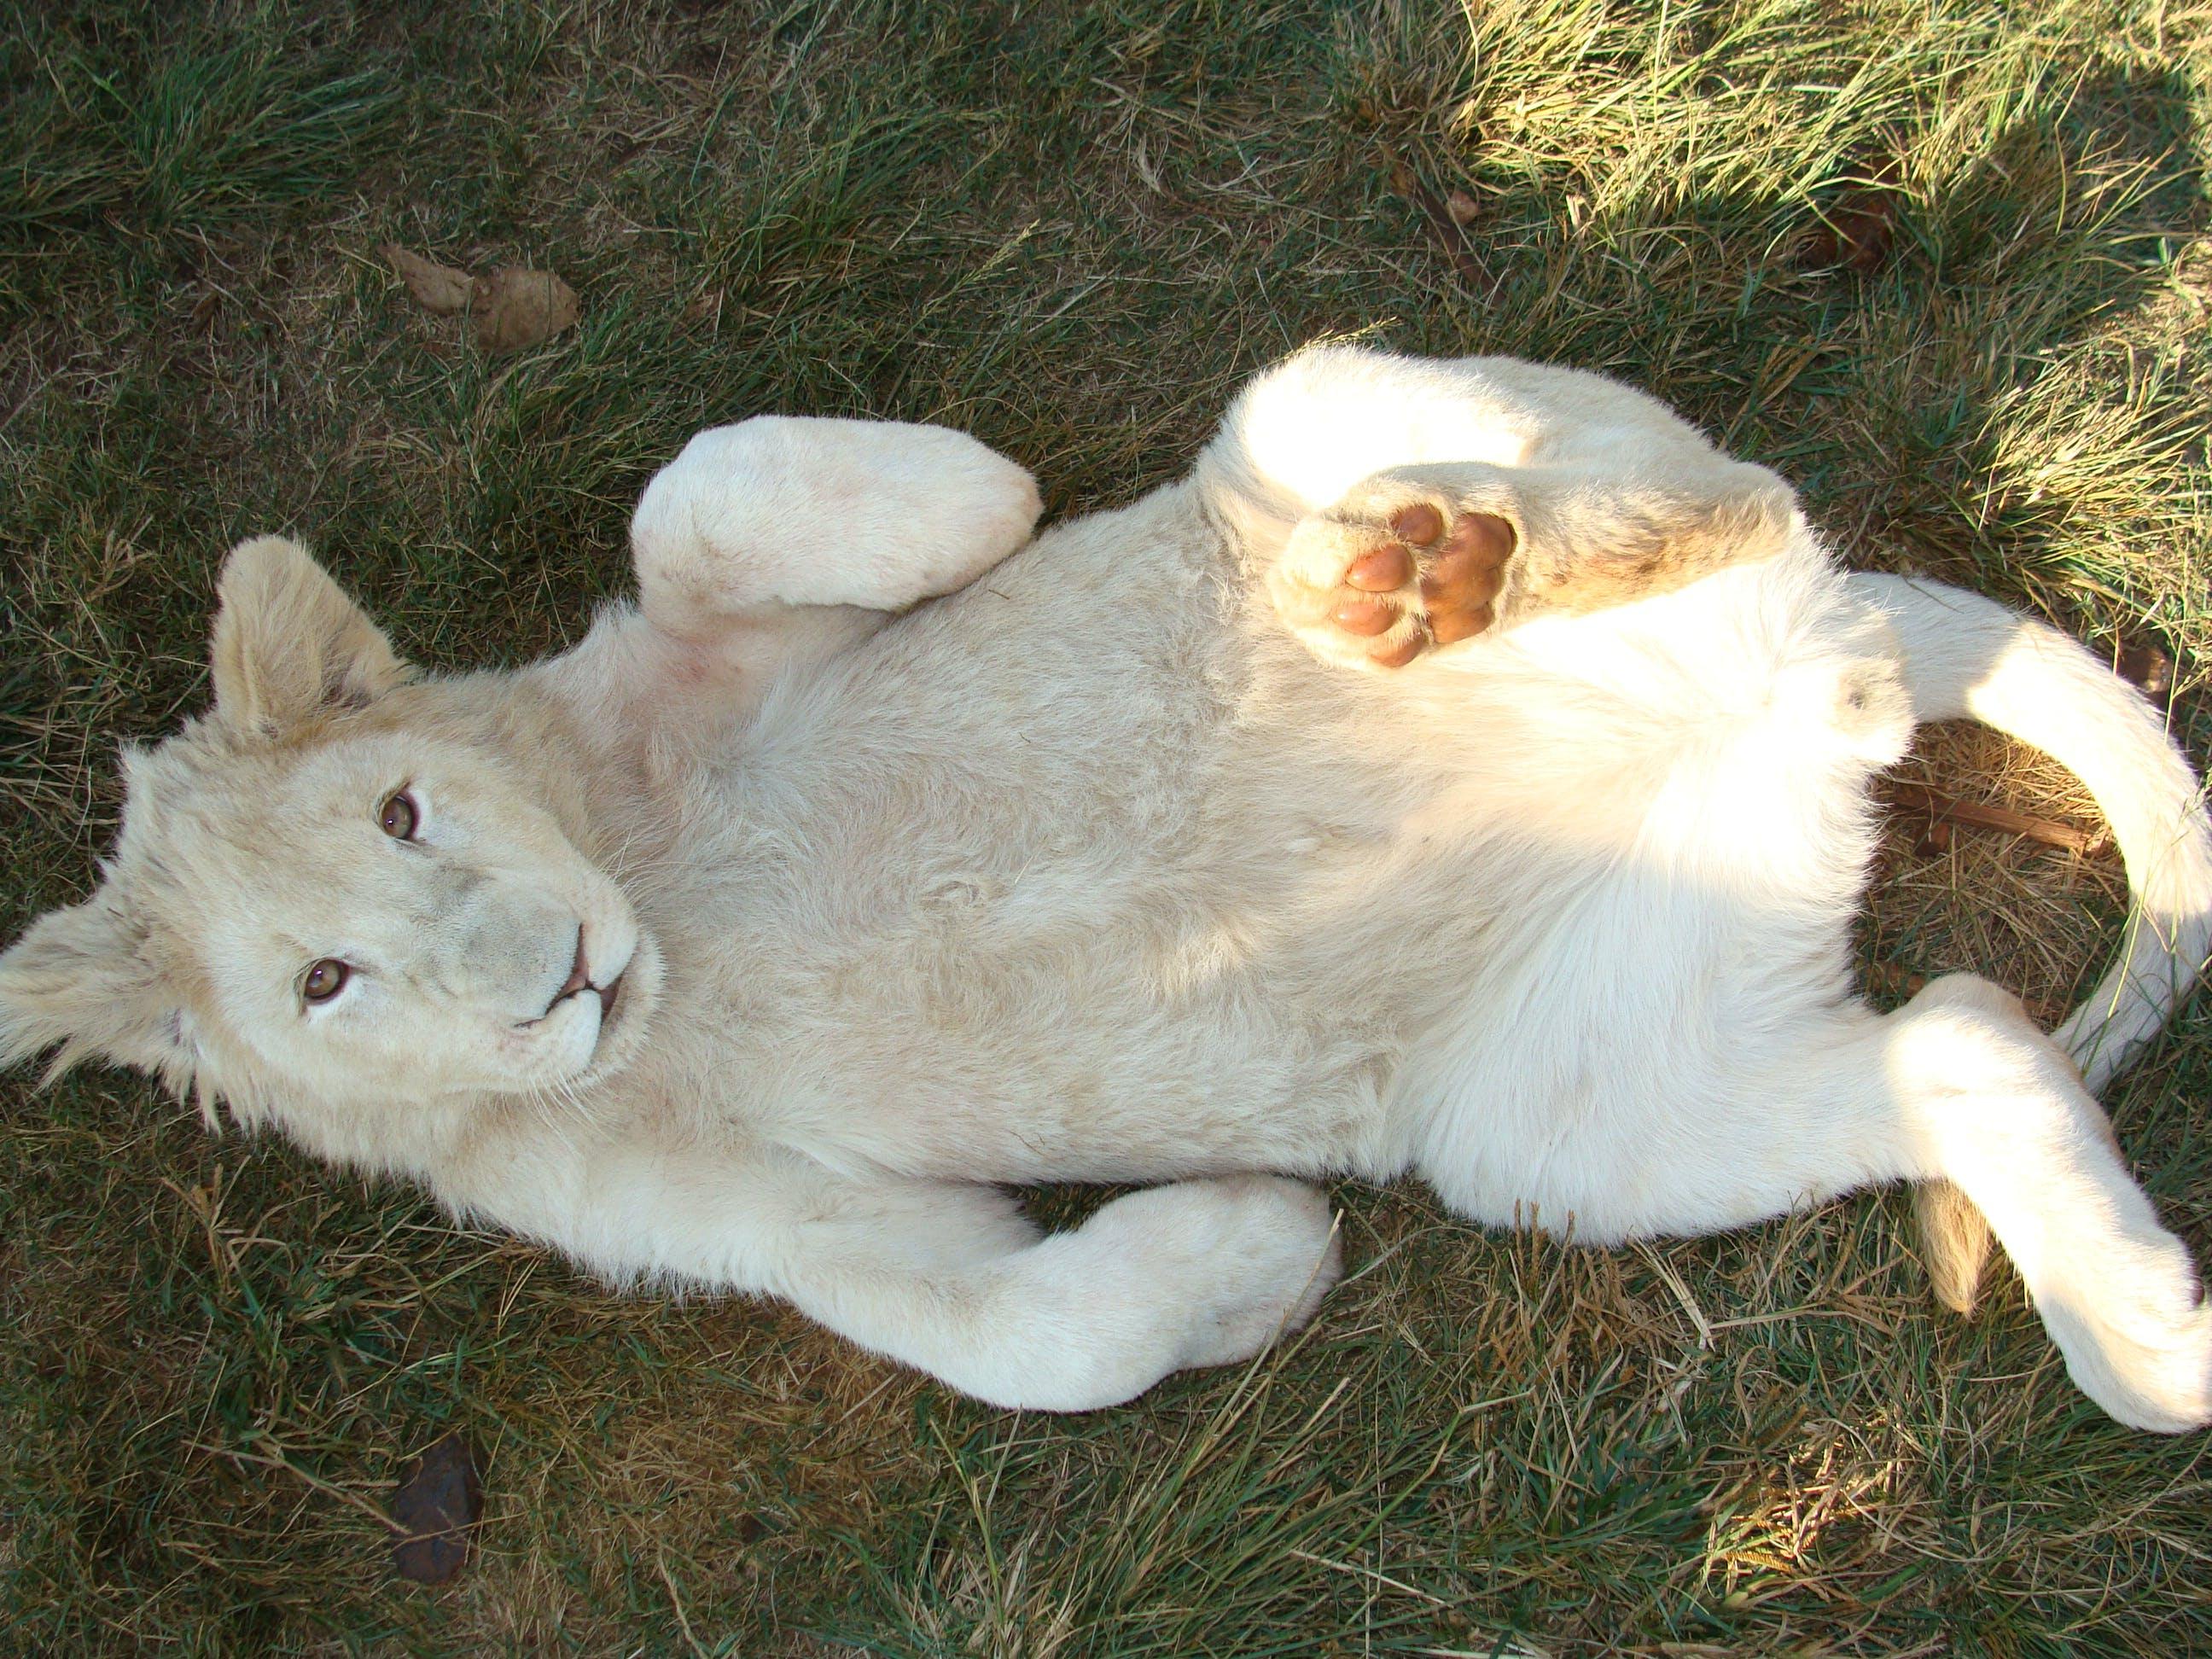 Lying Albino Tiger in the Grass